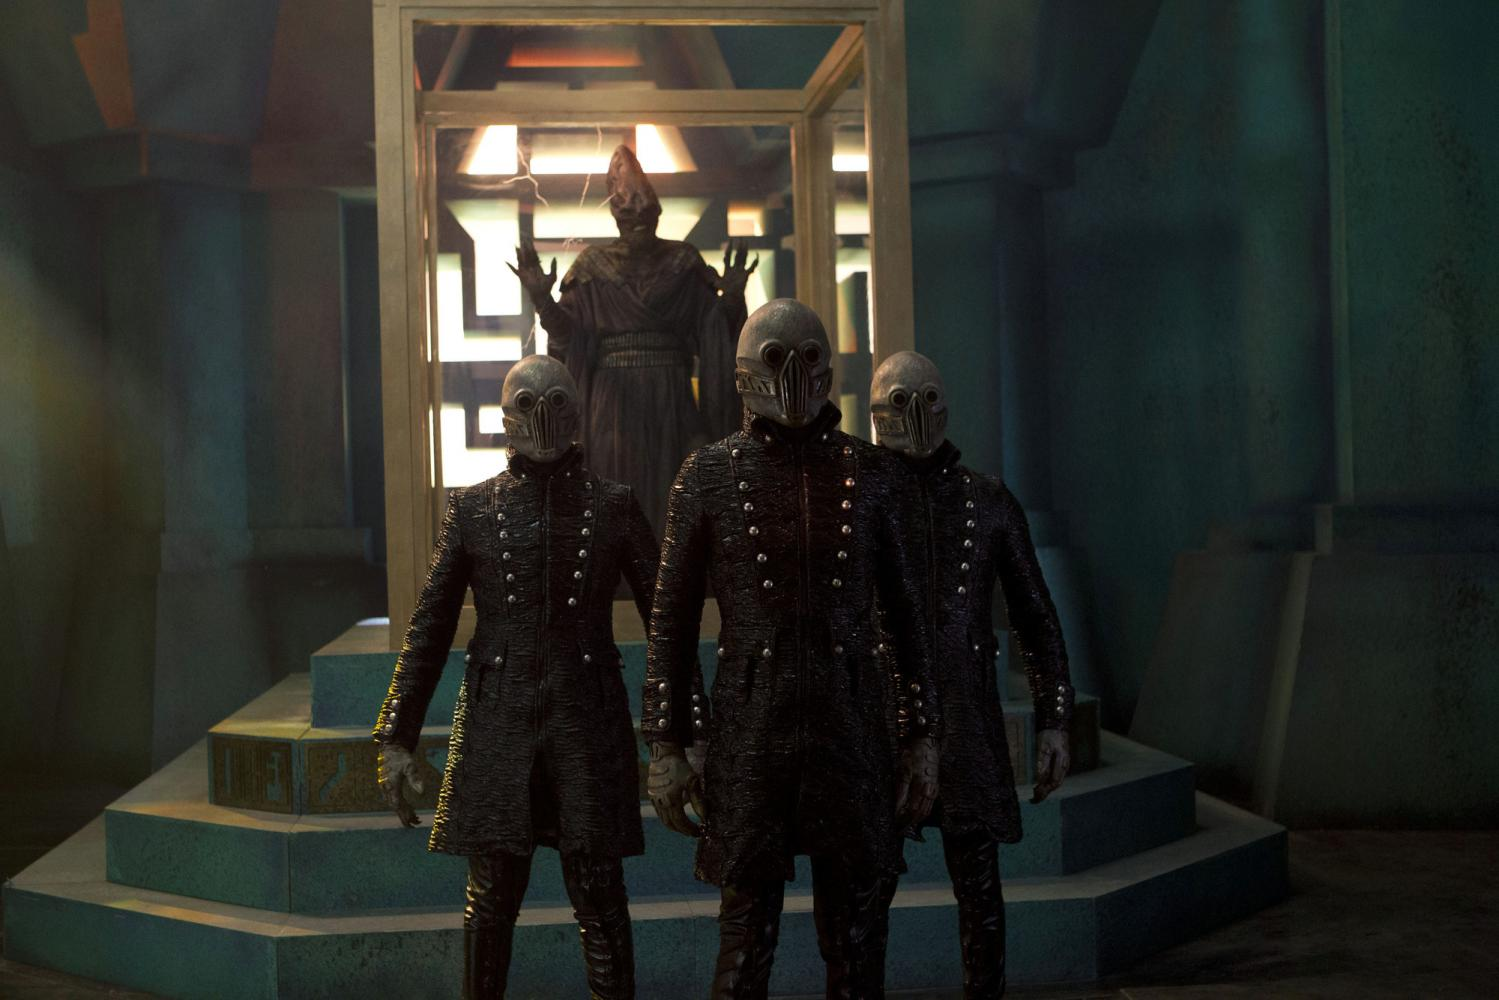 Doctor Who S07 E08: The Rings of Akhaten | Biff Bam Pop! | 1499 x 1000 jpeg 116kB